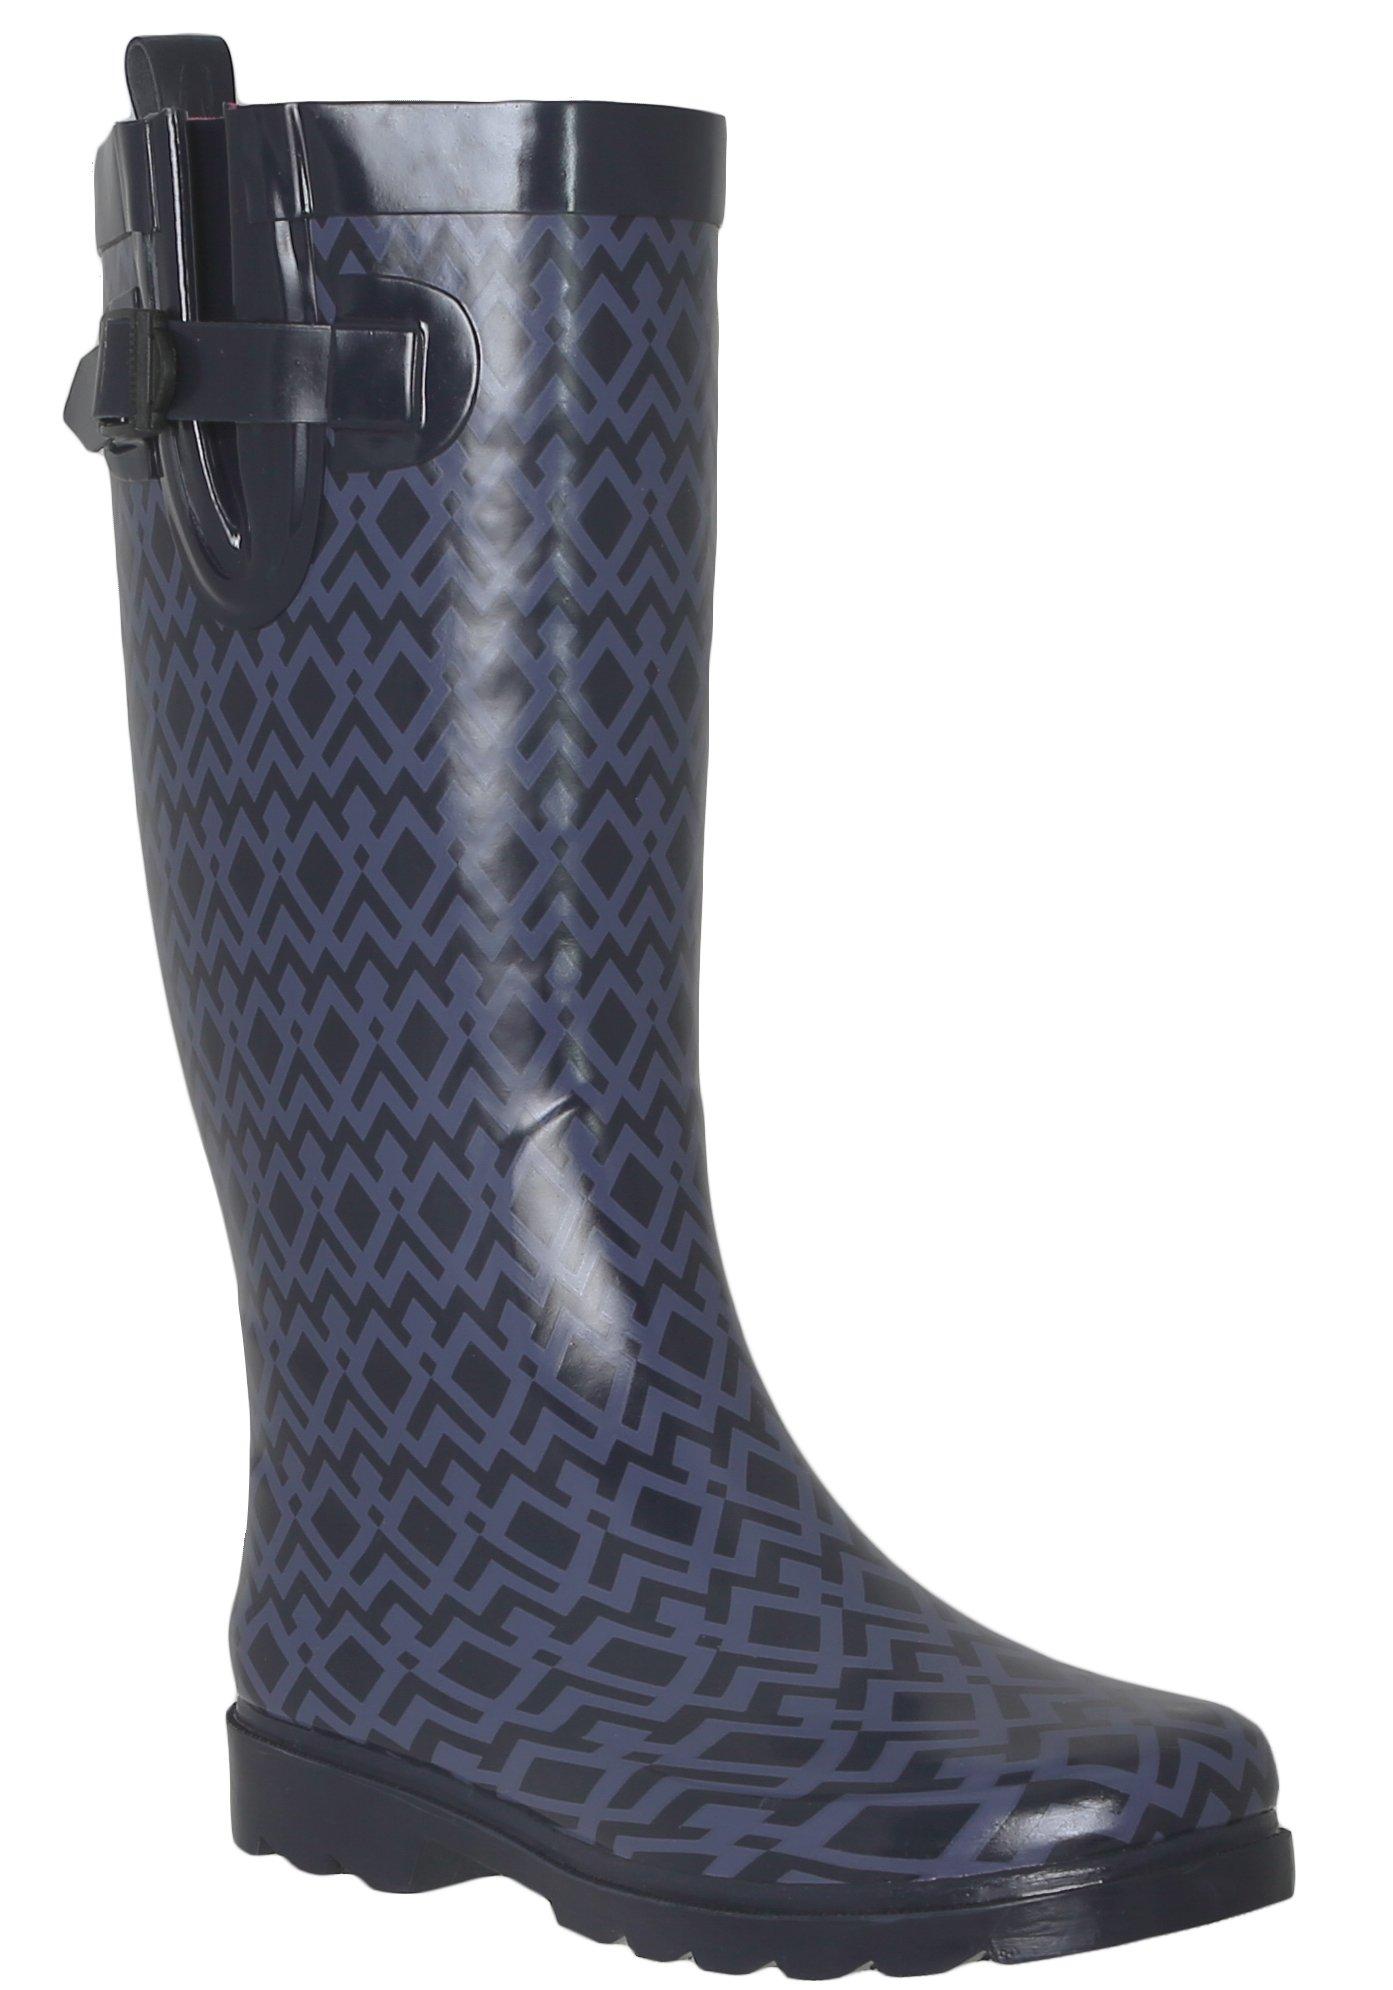 Capelli New York Ladies Shiny Diamond Geo Printed Rain Boot Navy Combo 8